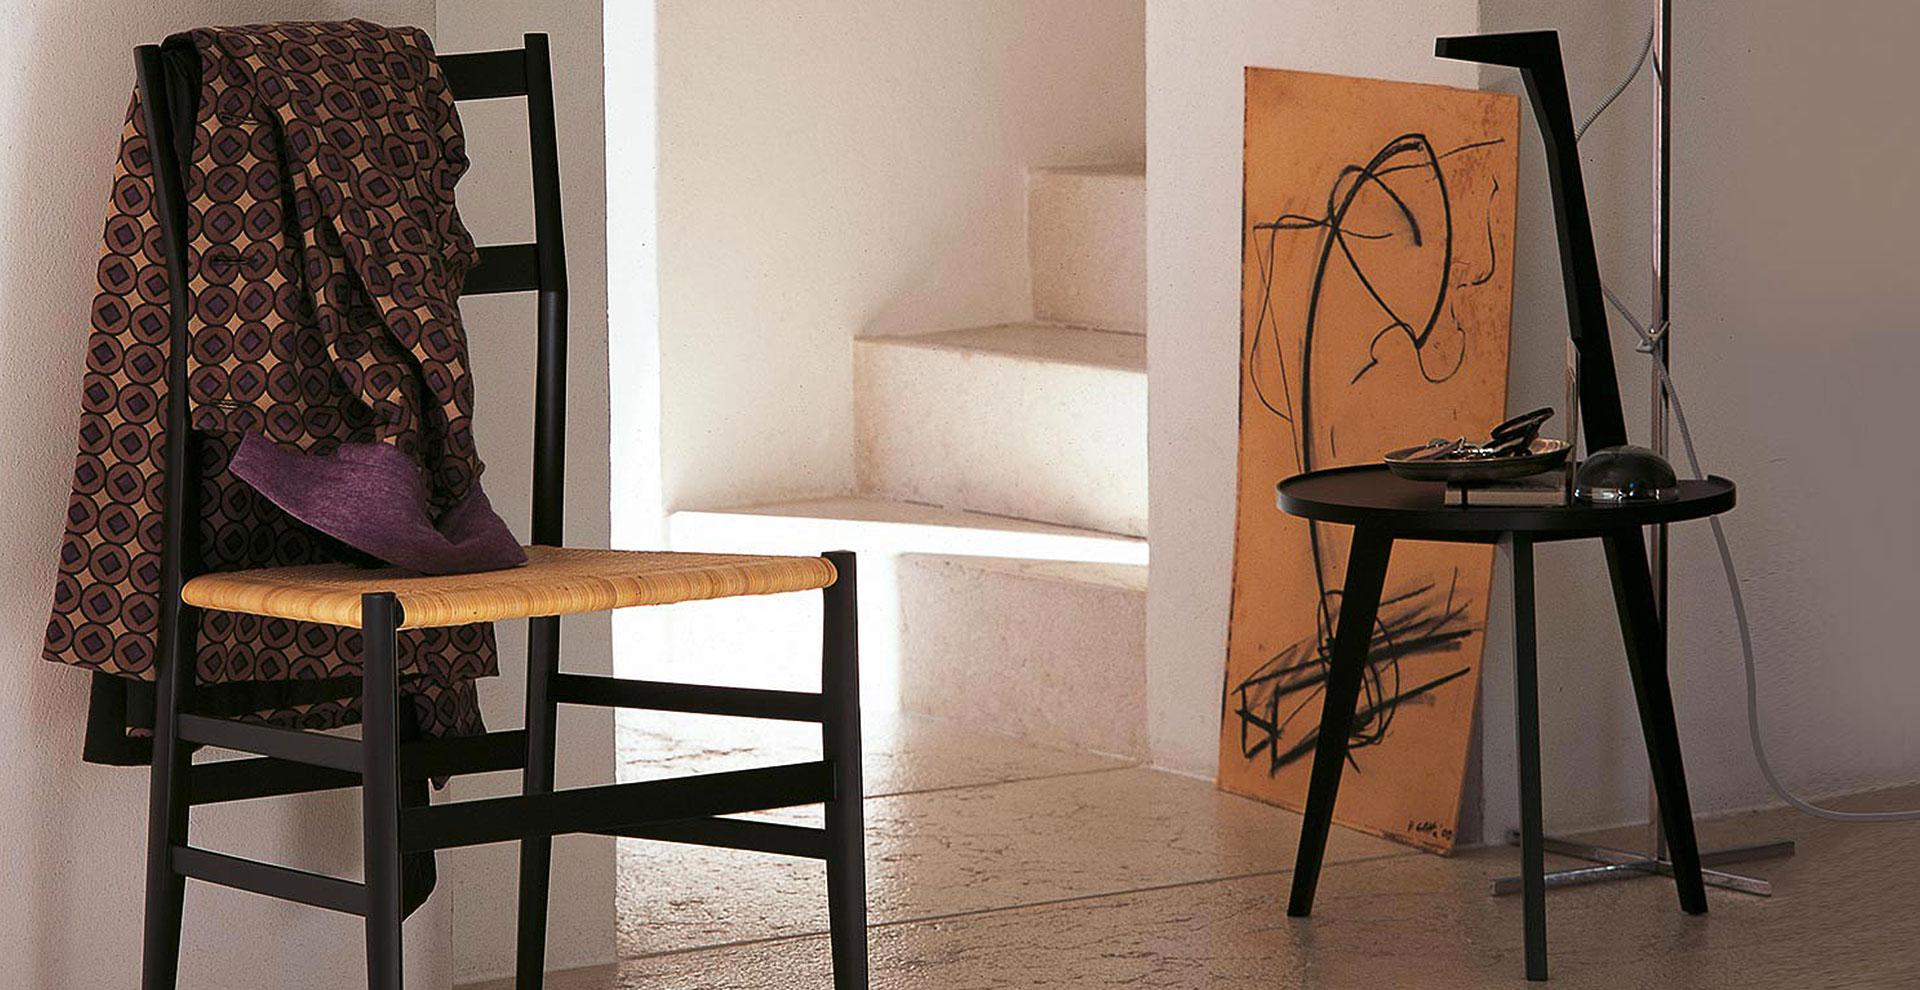 699 superleggera cassina stuhle 699 superleggera cassina. Black Bedroom Furniture Sets. Home Design Ideas